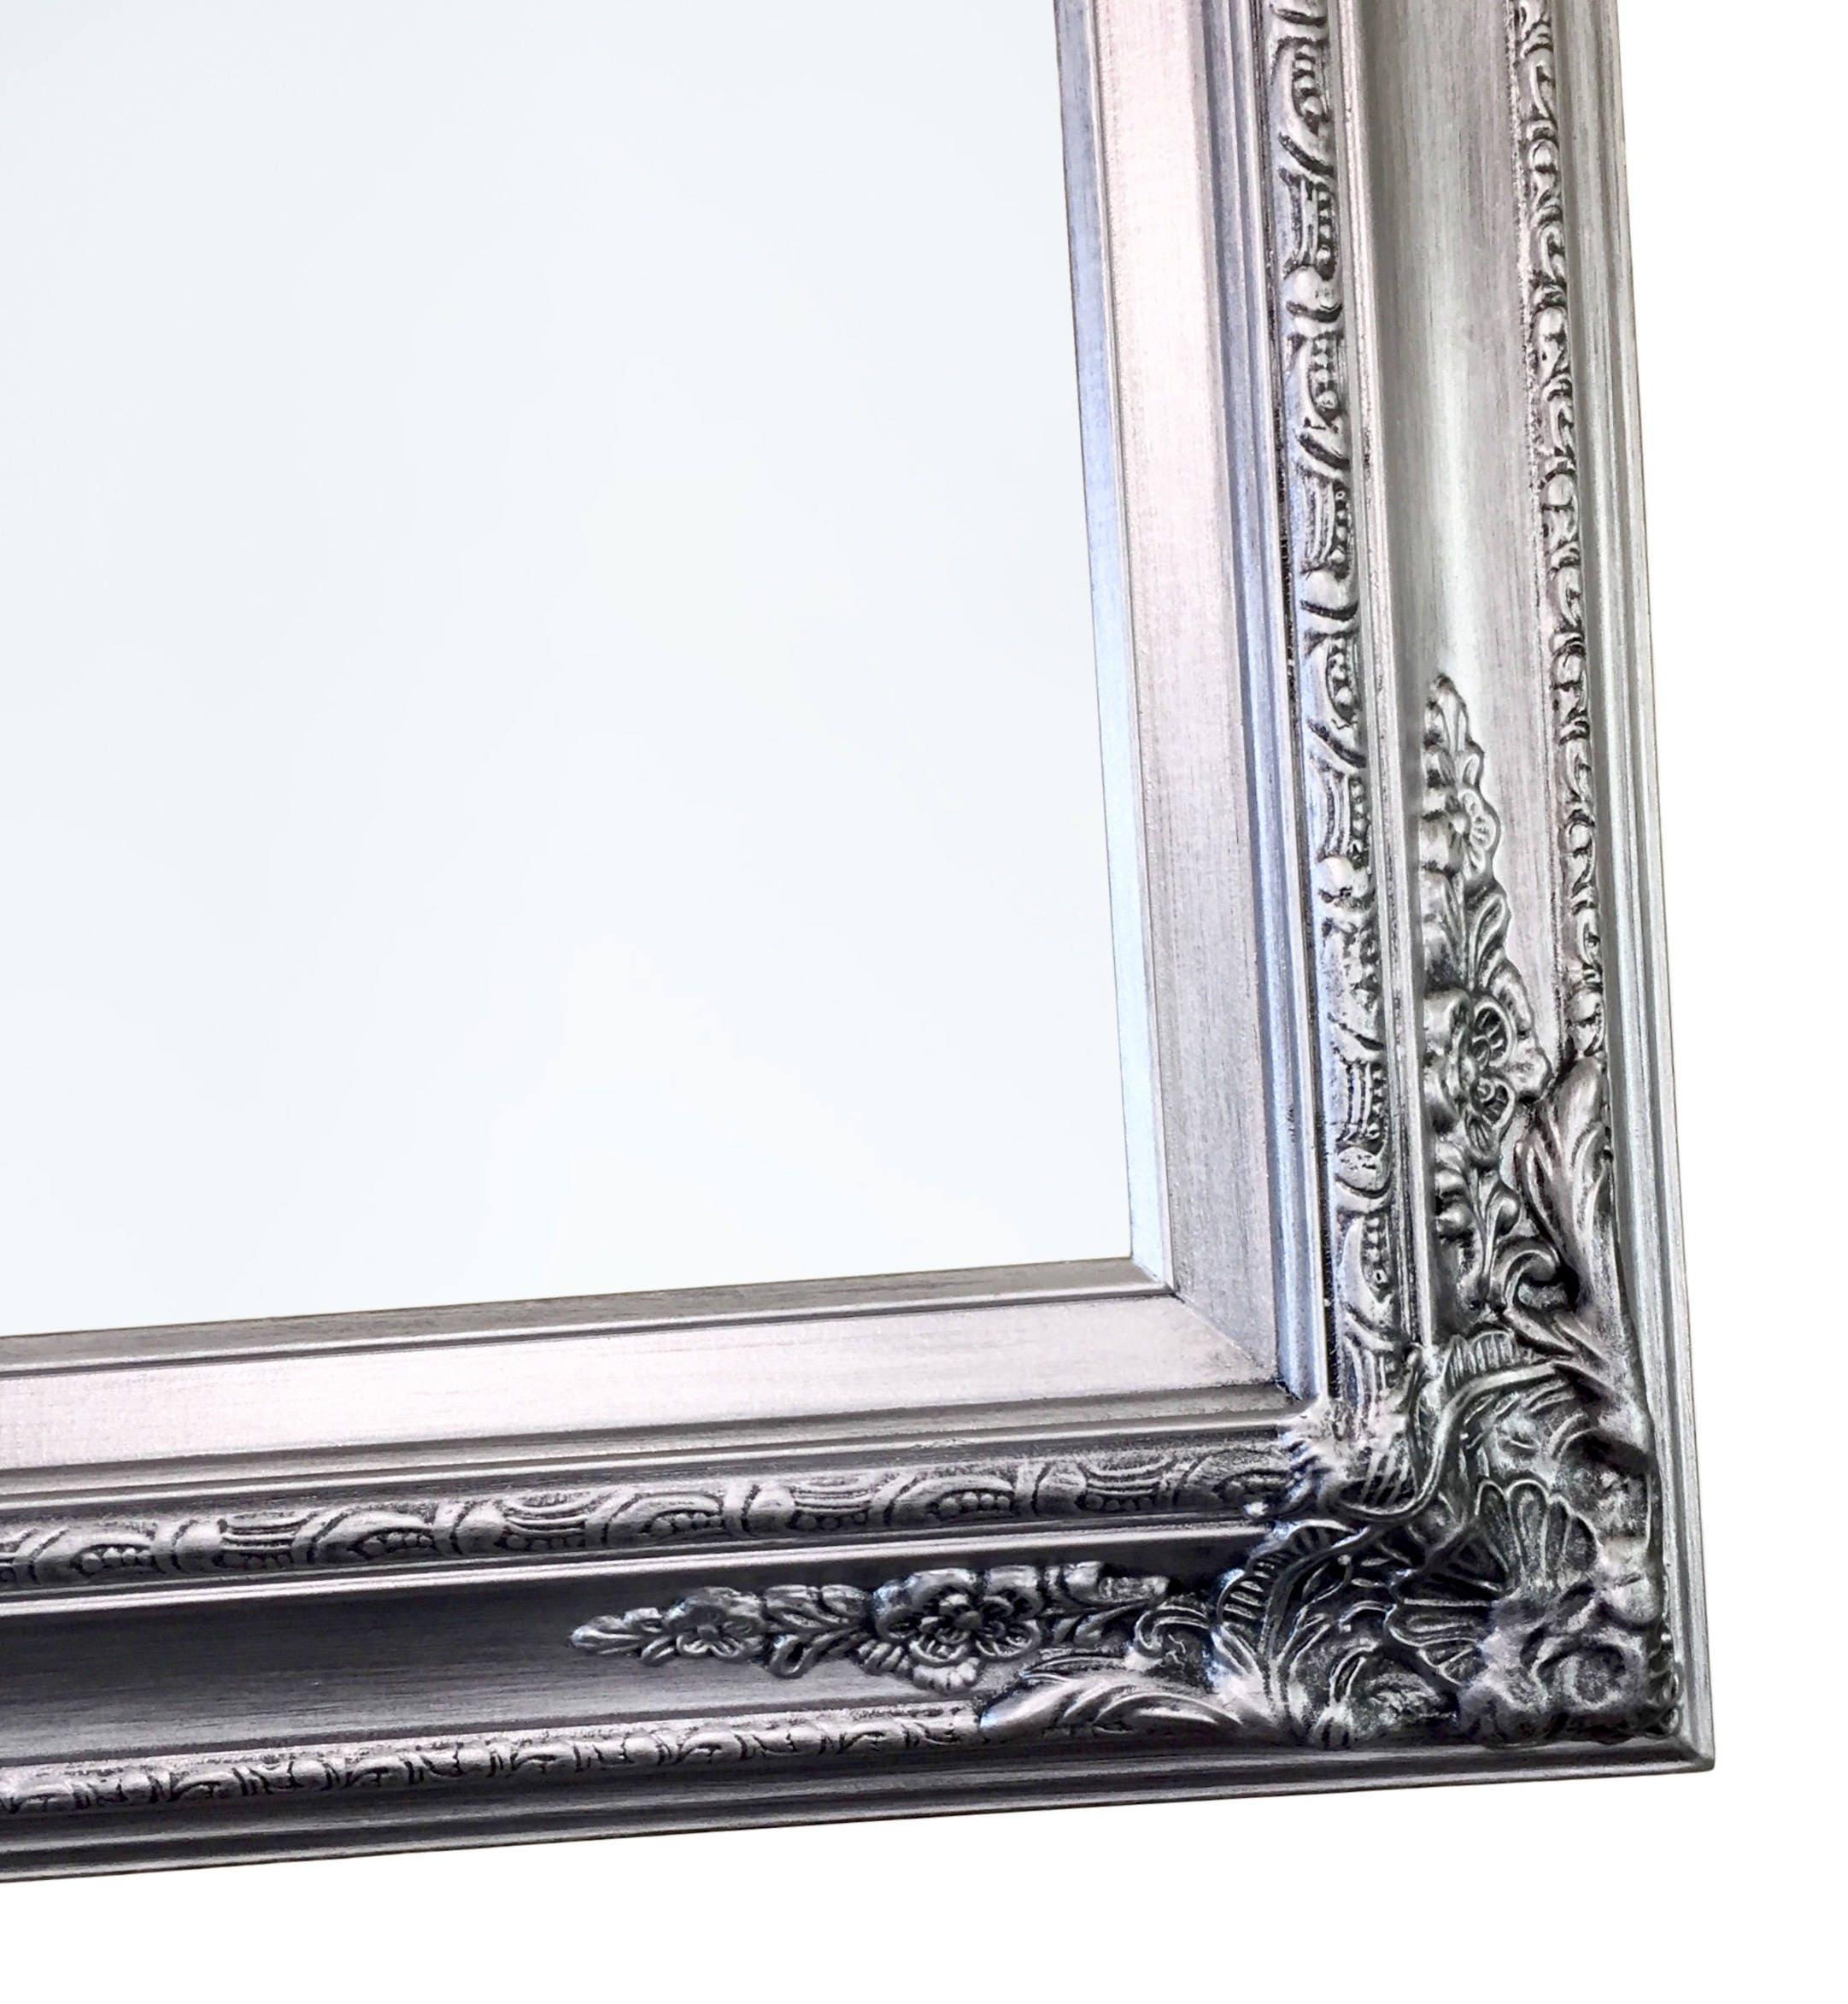 BATHROOM VANITY MIRRORS For Sale 44x32 Silver | Etsy